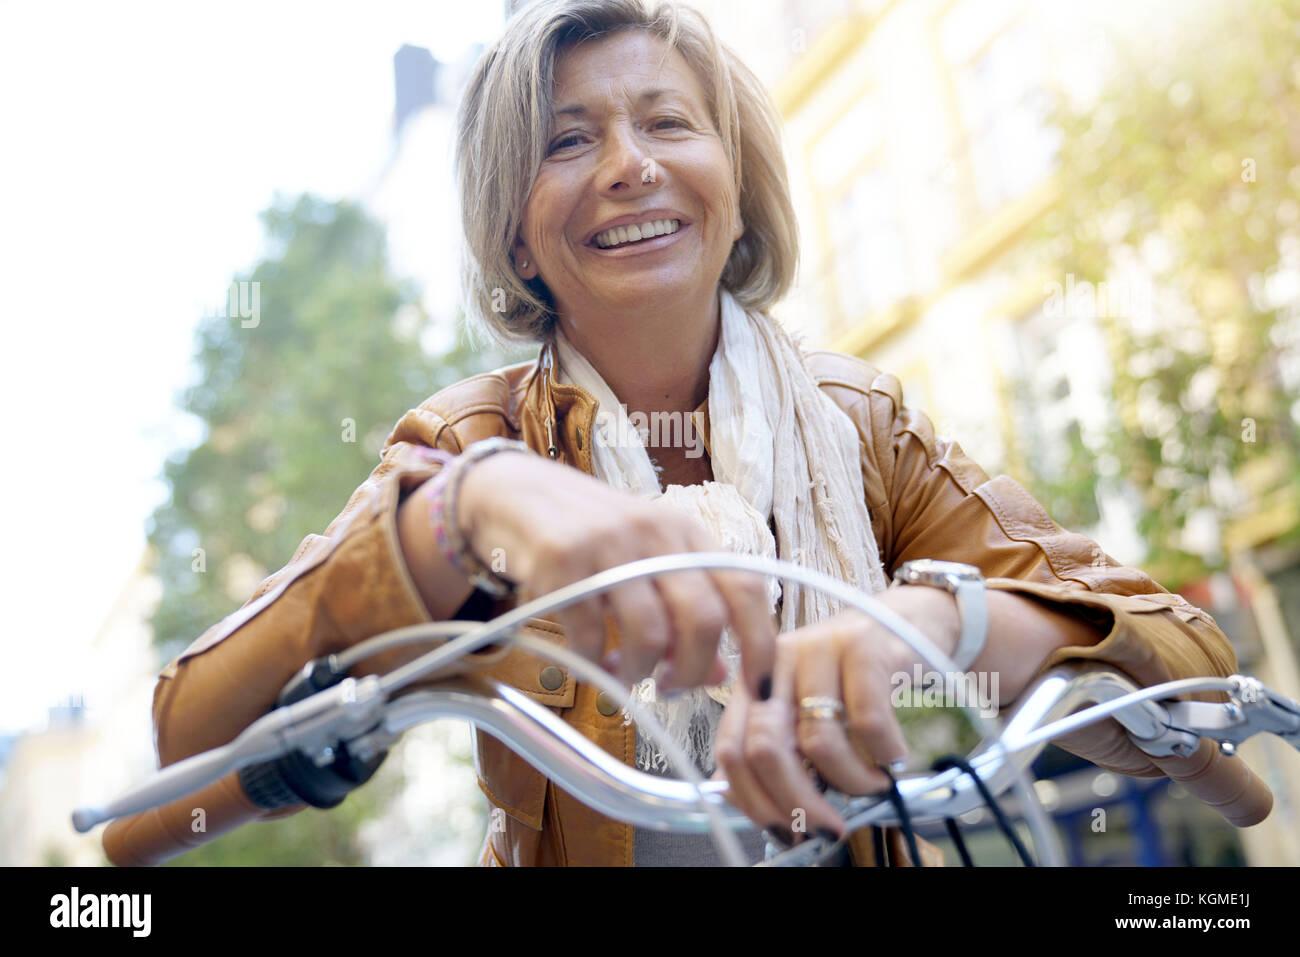 Portrait of senior woman riding city bike - Stock Image